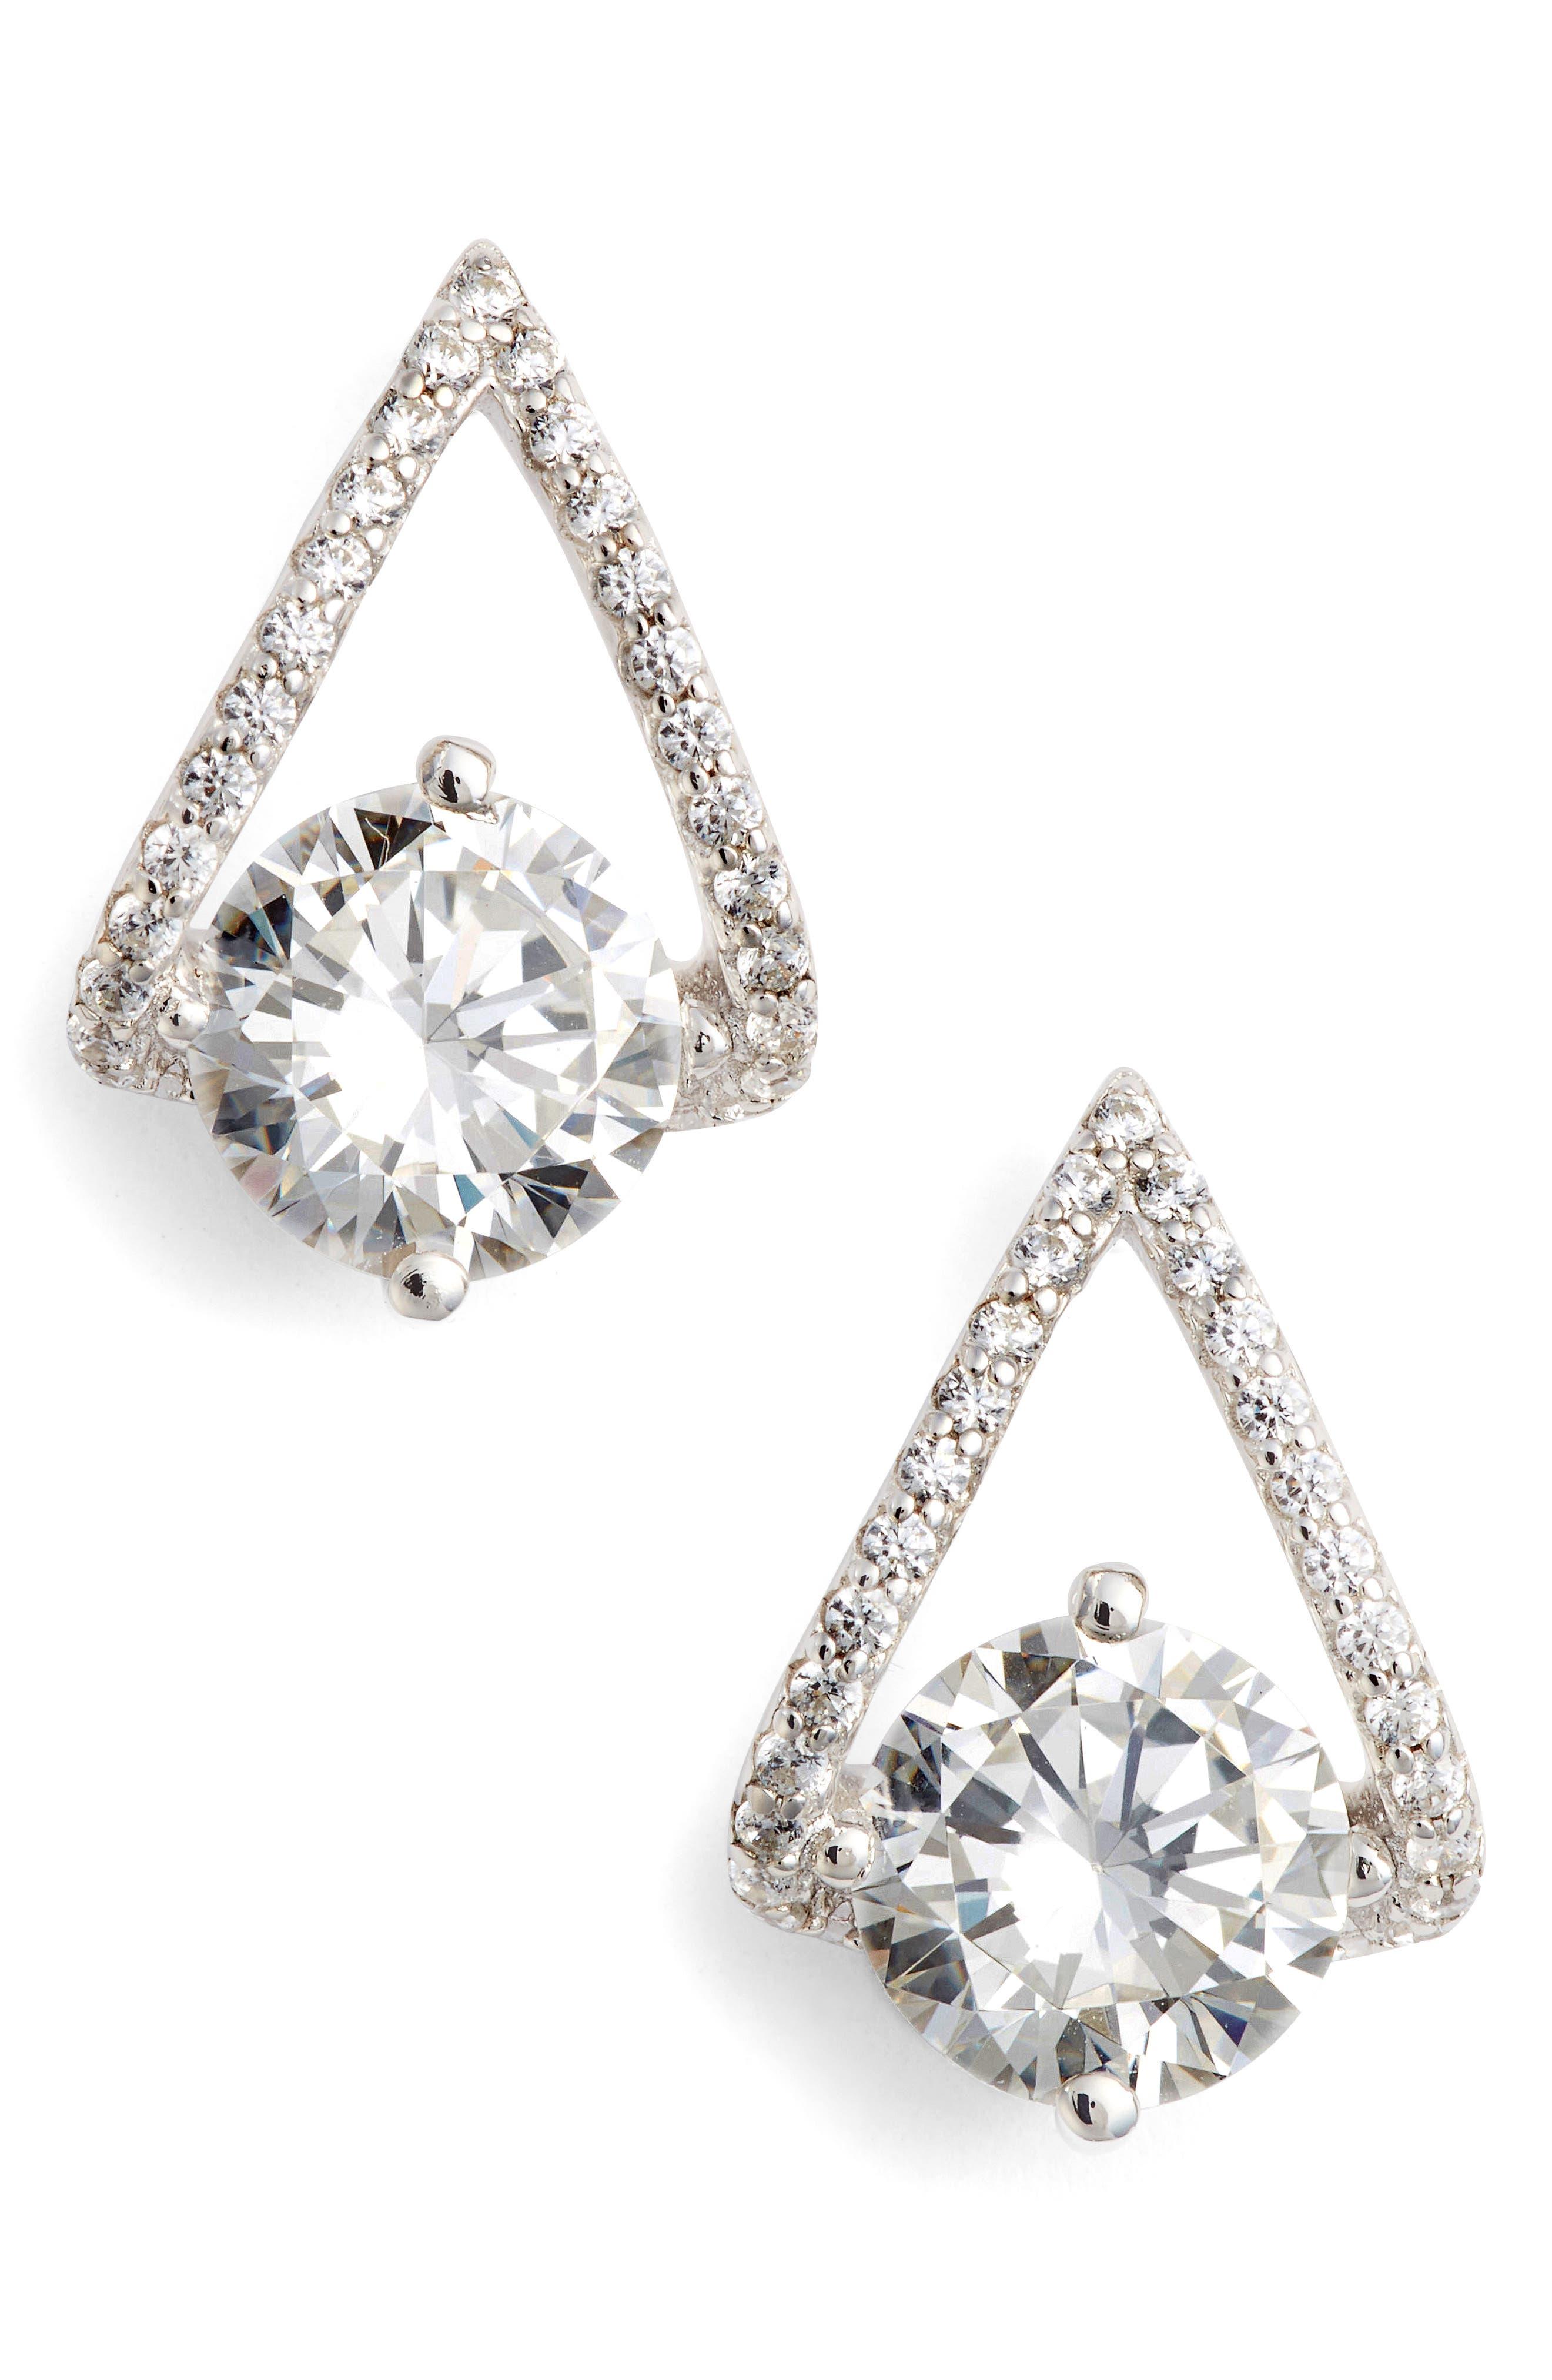 Simulated Diamond Drop Earrings,                         Main,                         color, Silver/ Clear